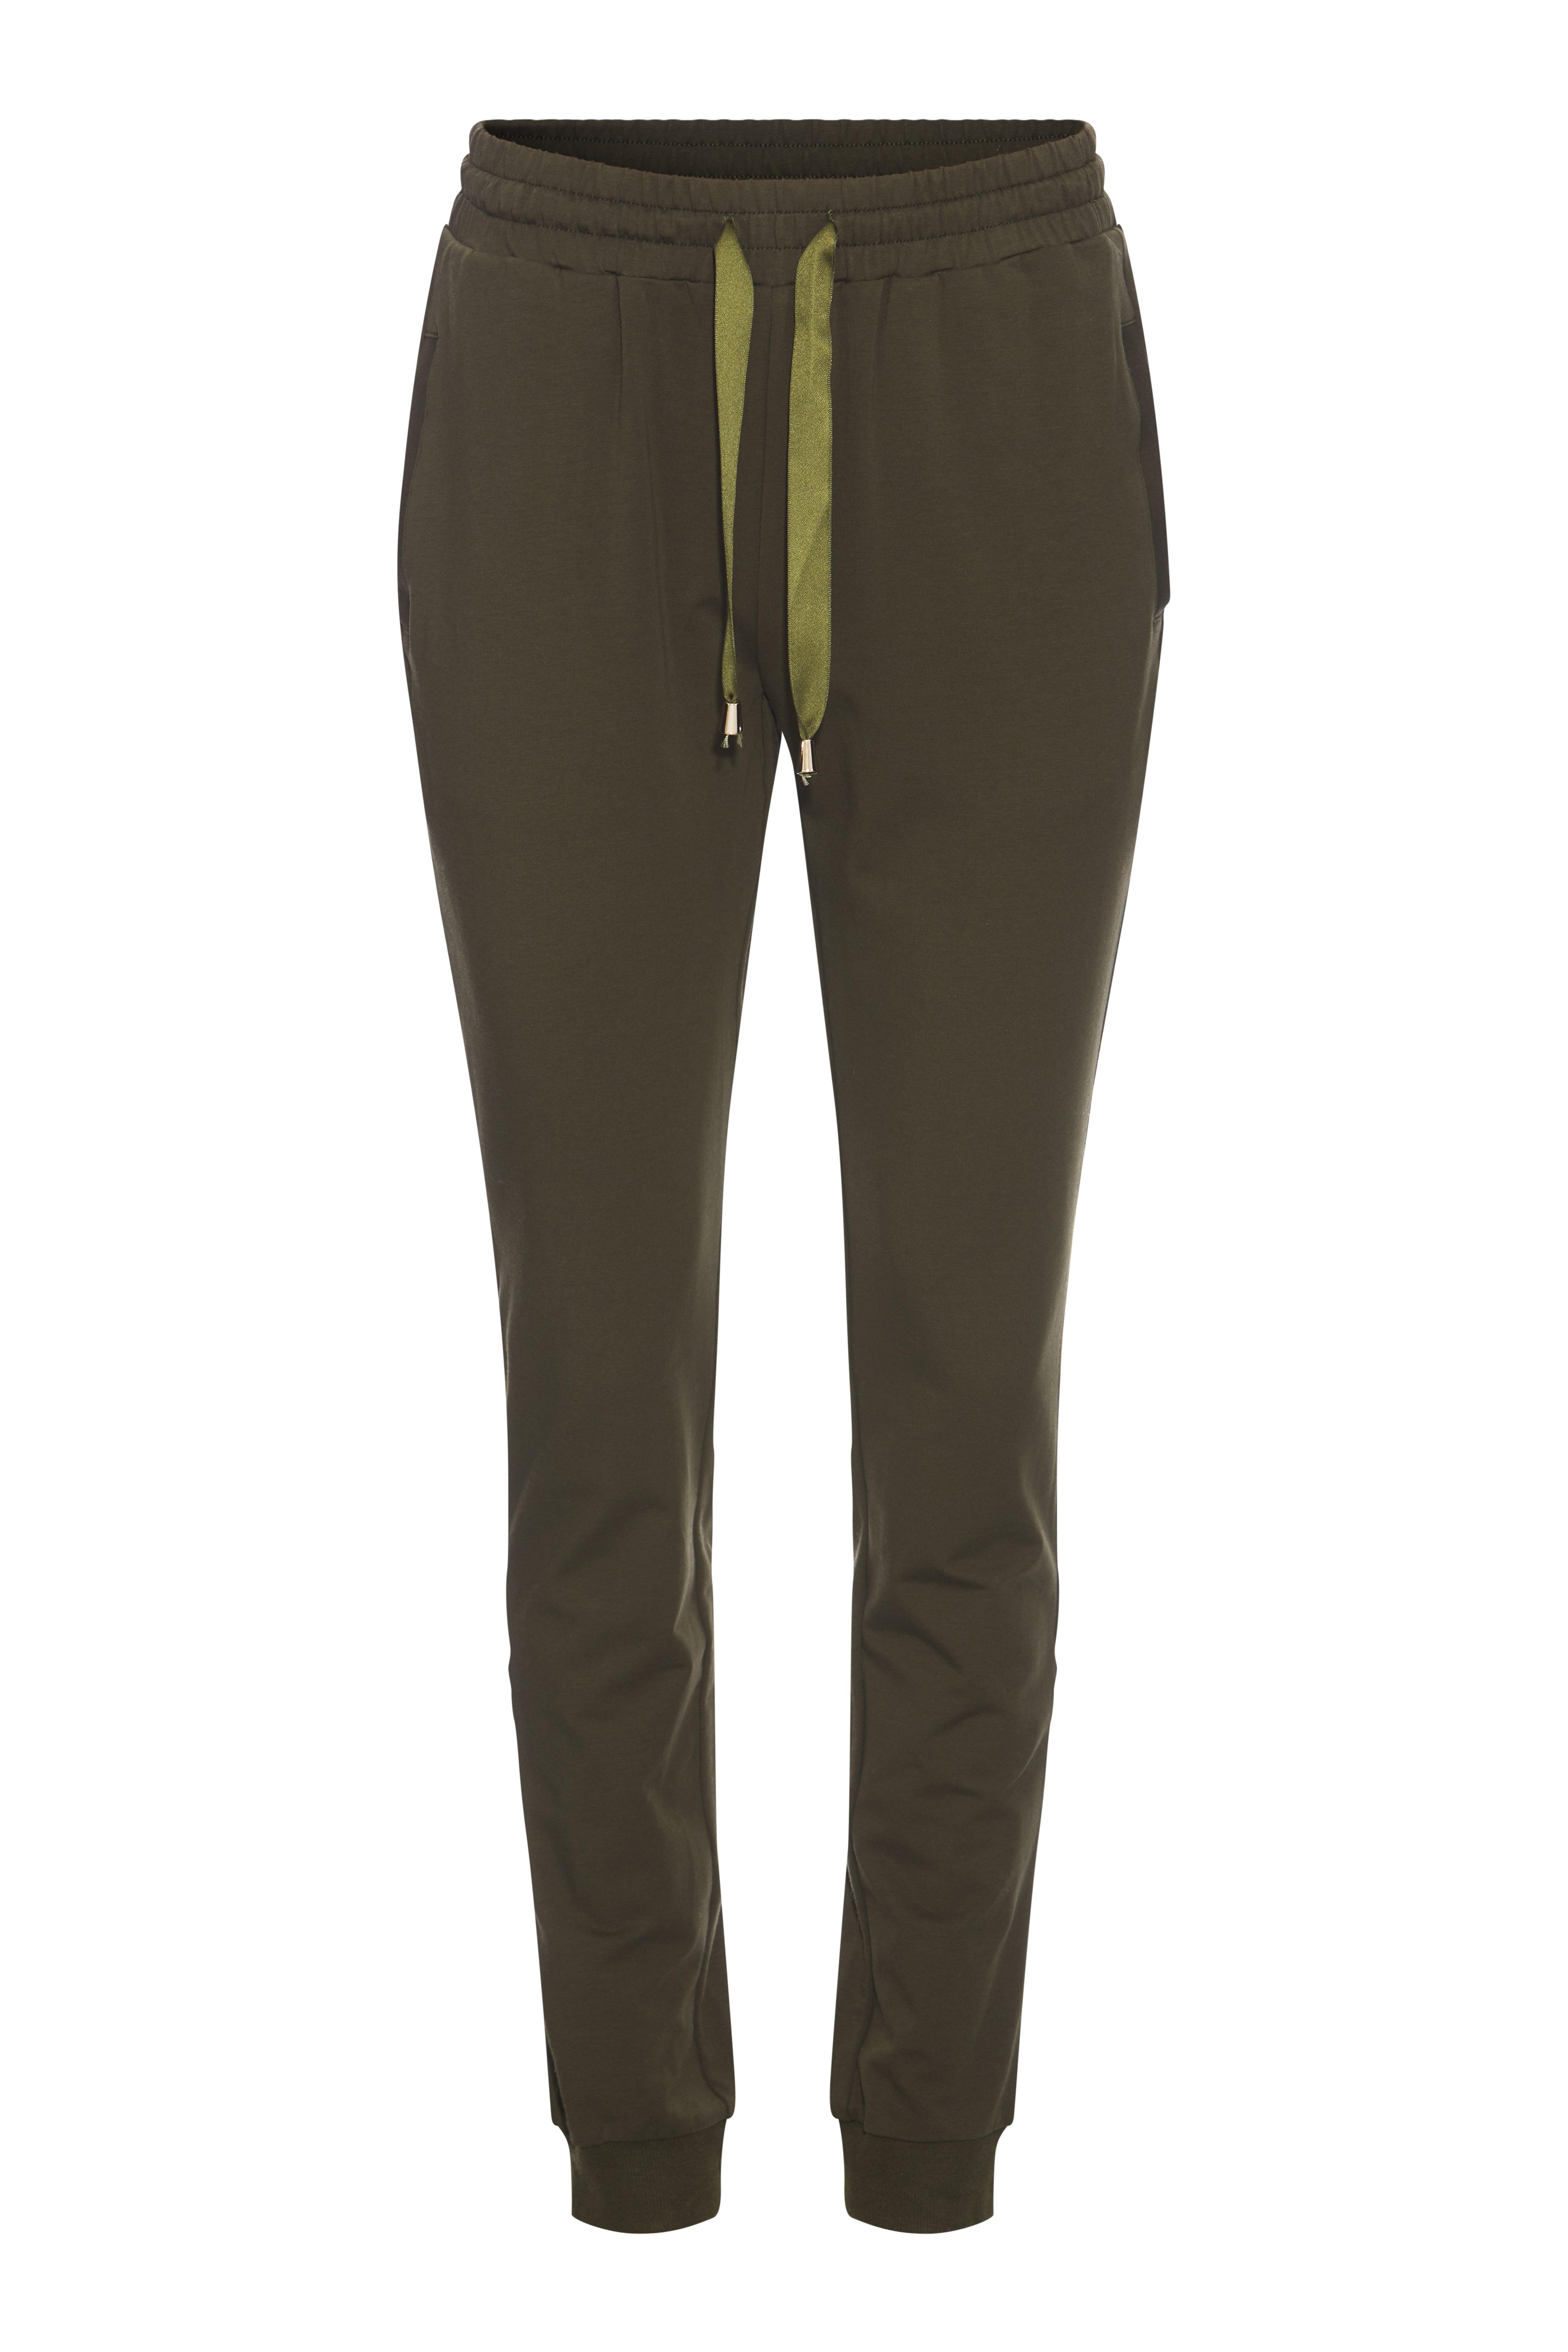 PBO 2391 Jalli sweatpants, ivy green, xx-large